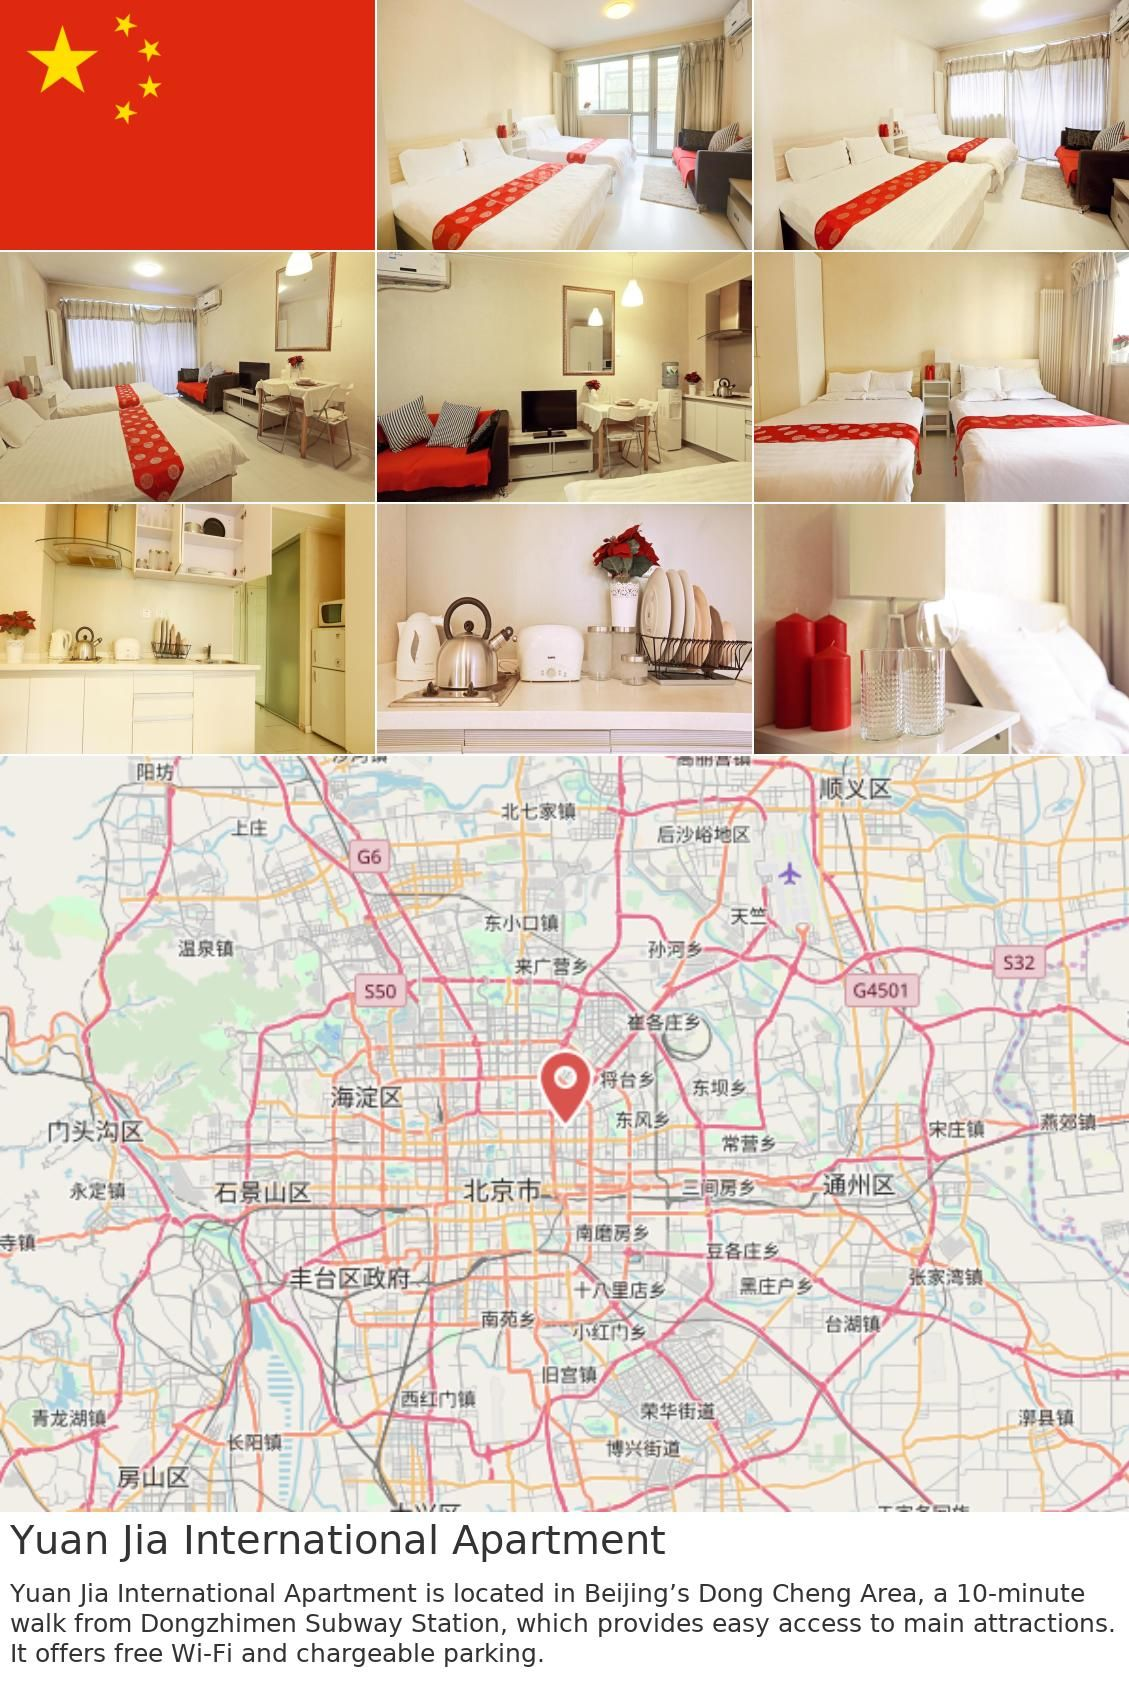 Yuan Jia International Apartment